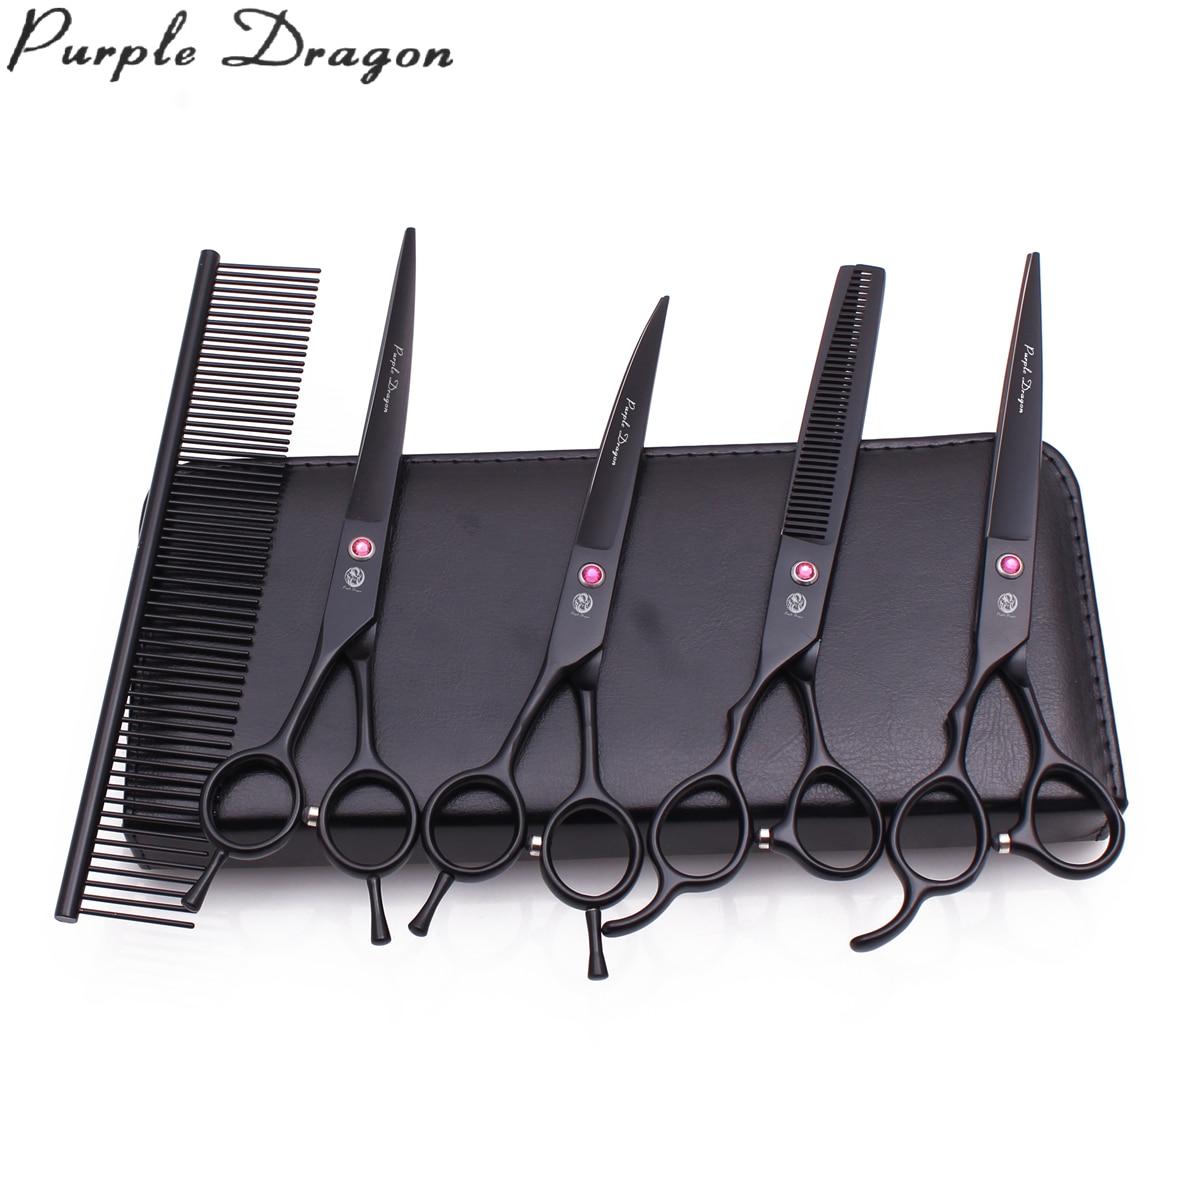 "Left Hand Purple Dragon 7"" Japanese Steel Professional Pet Scissors Set Animal Thinning Shears 3006# Dog Hair Scissors Set Black"